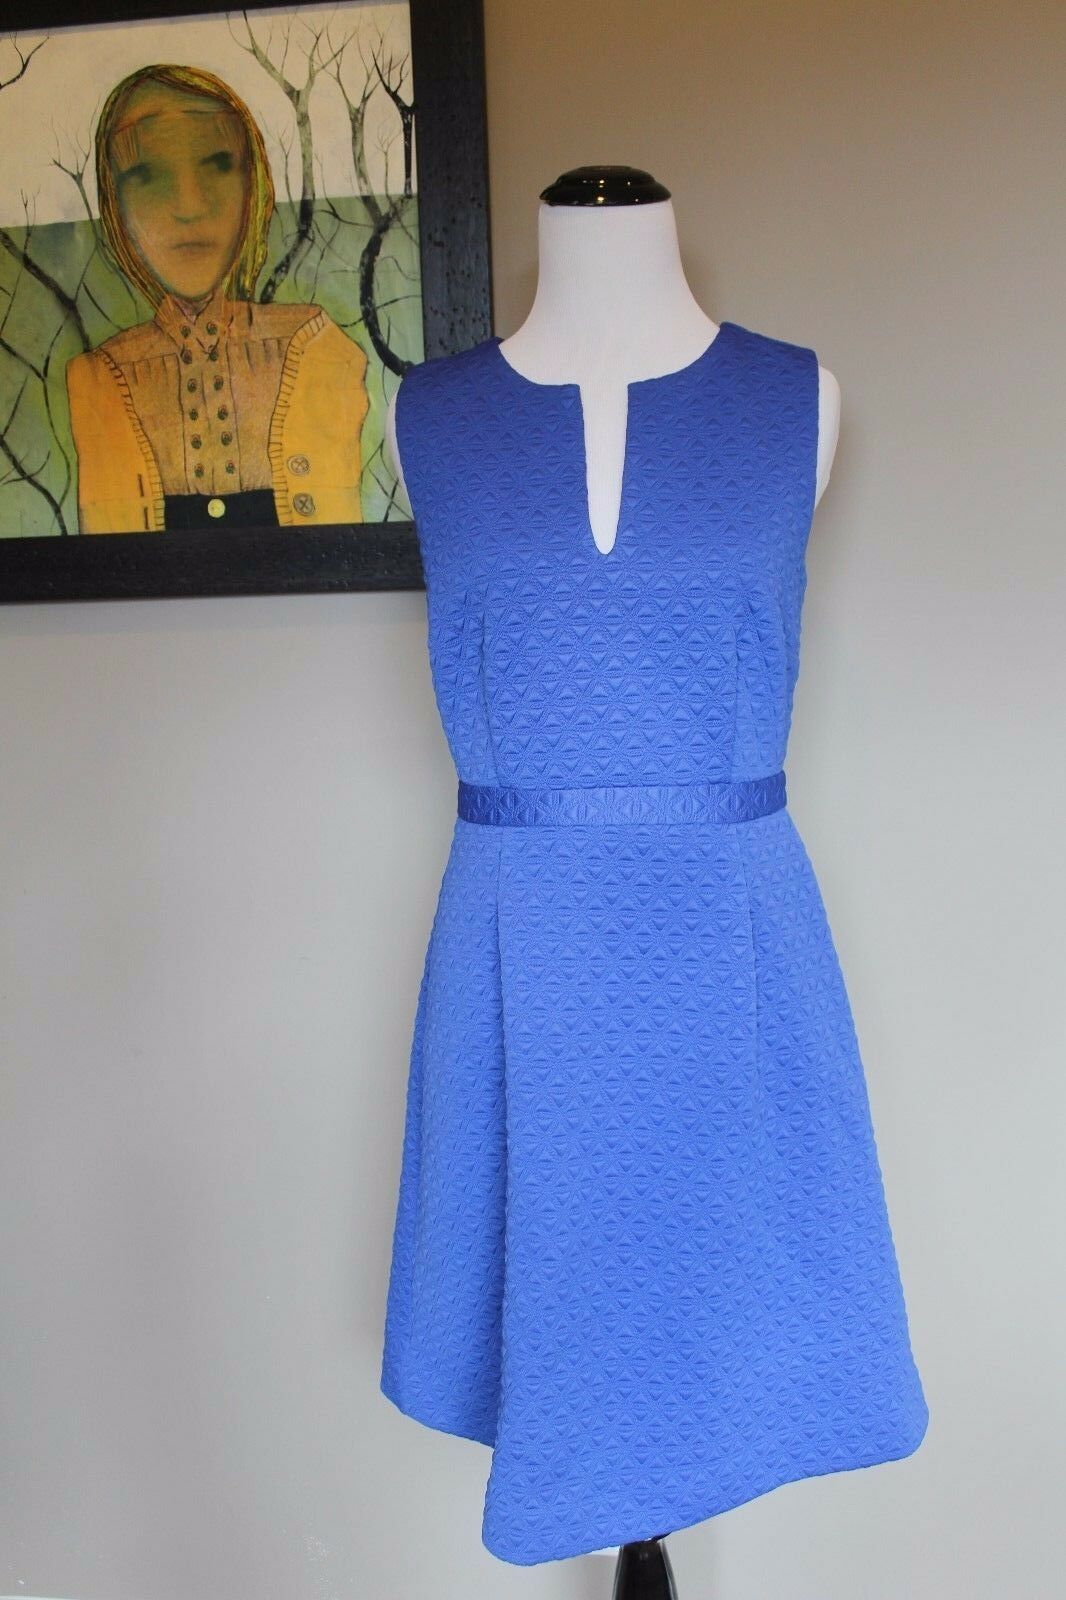 NWT J Crew Sleeveless Textured Jacquard Dress Bistro bluee C4507  Sz 4 Small